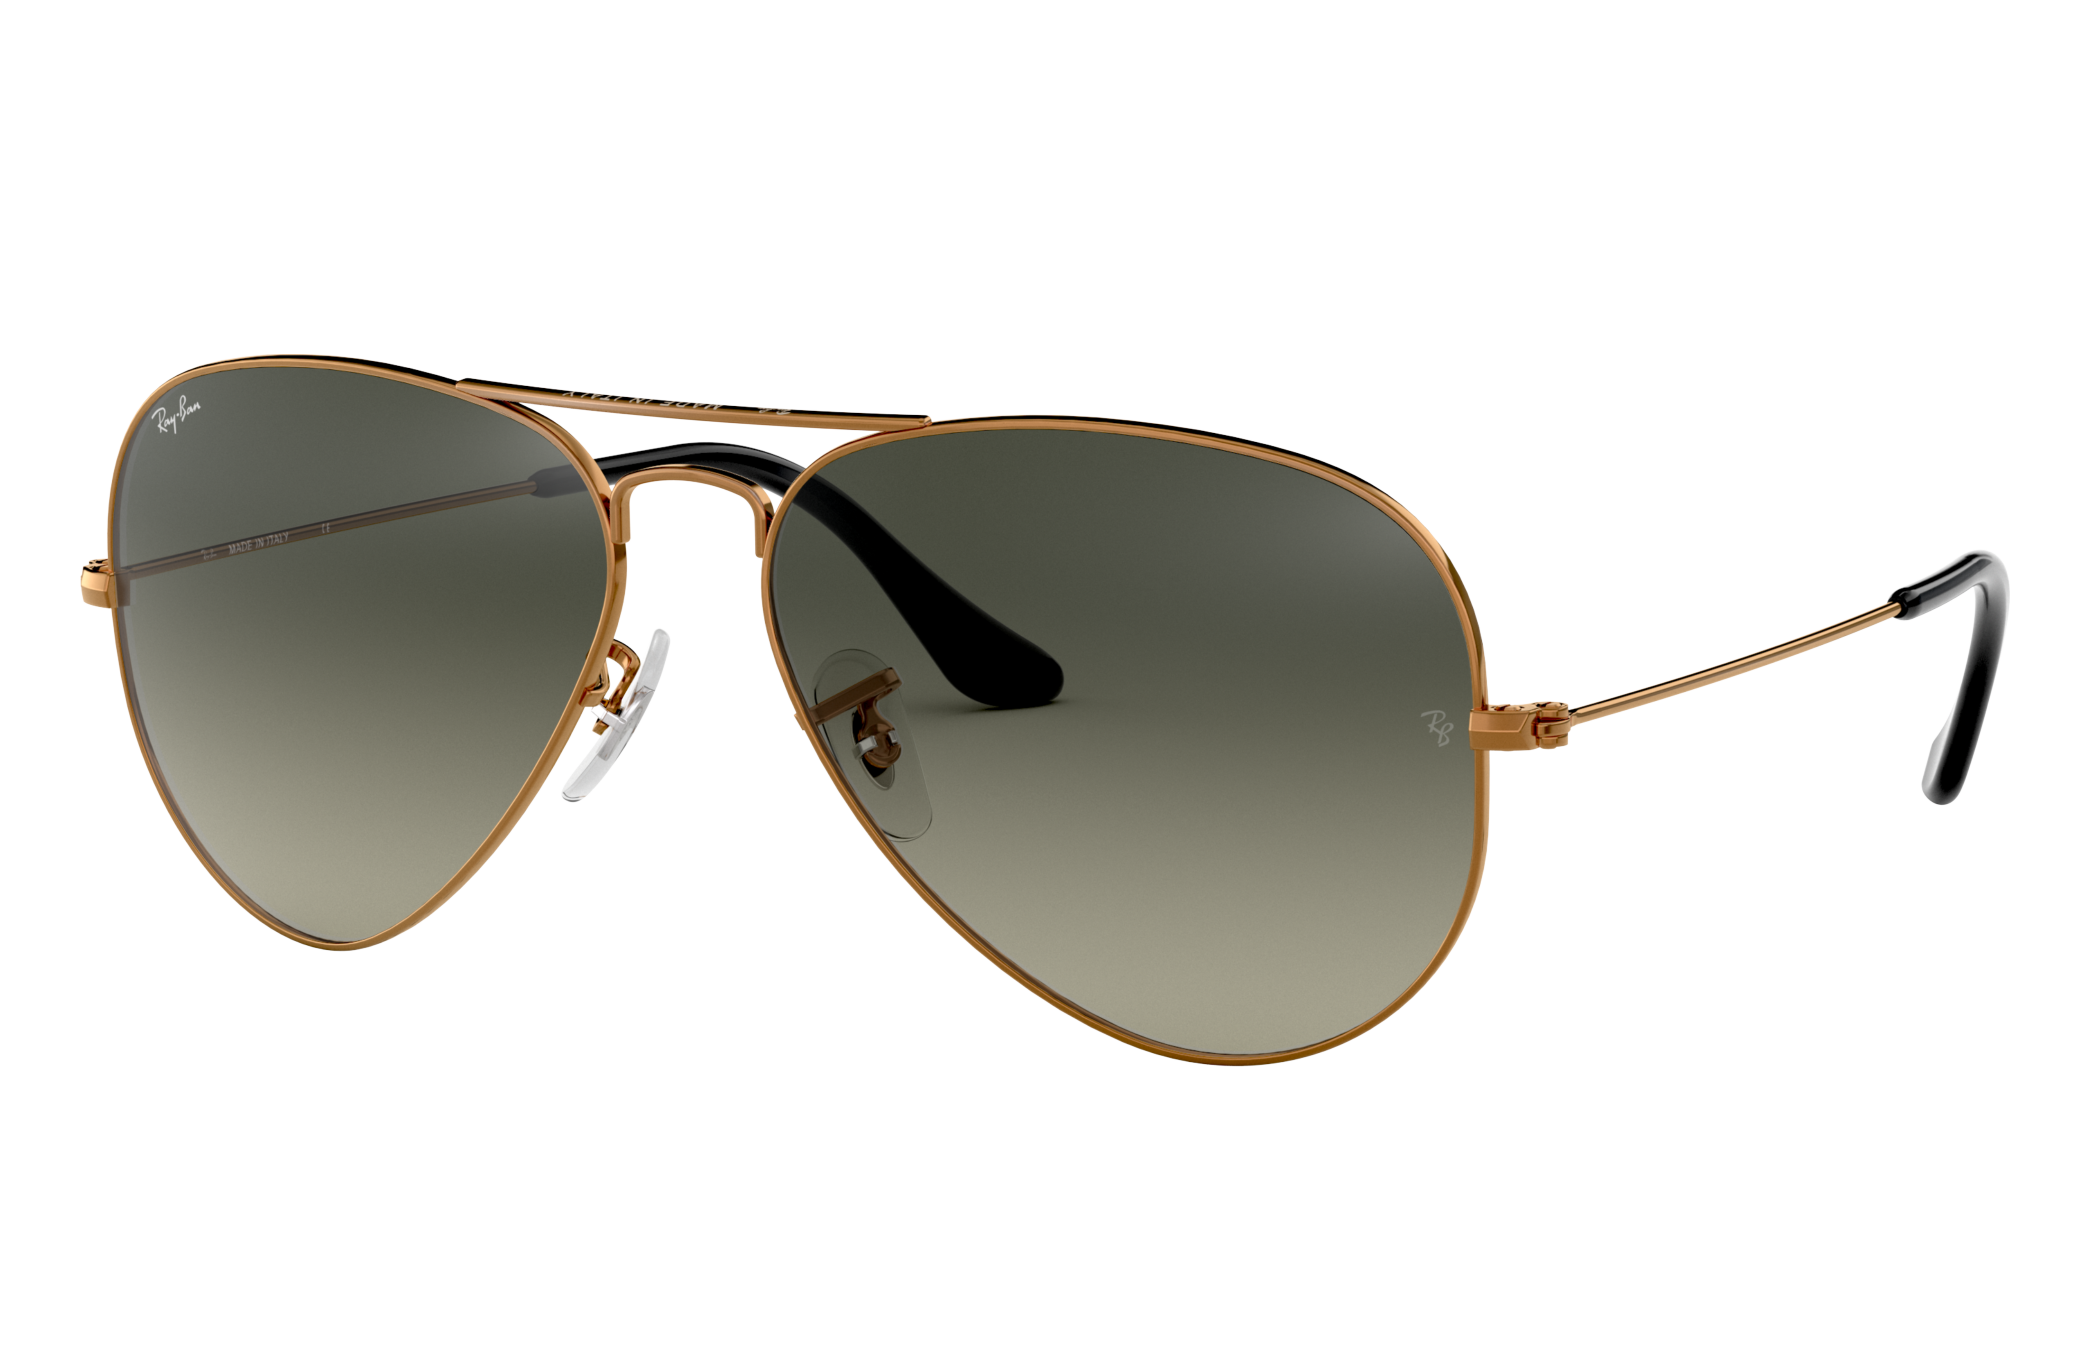 Ray-Ban Aviator Gradient Bronze-Copper, Gray Lenses - RB3025